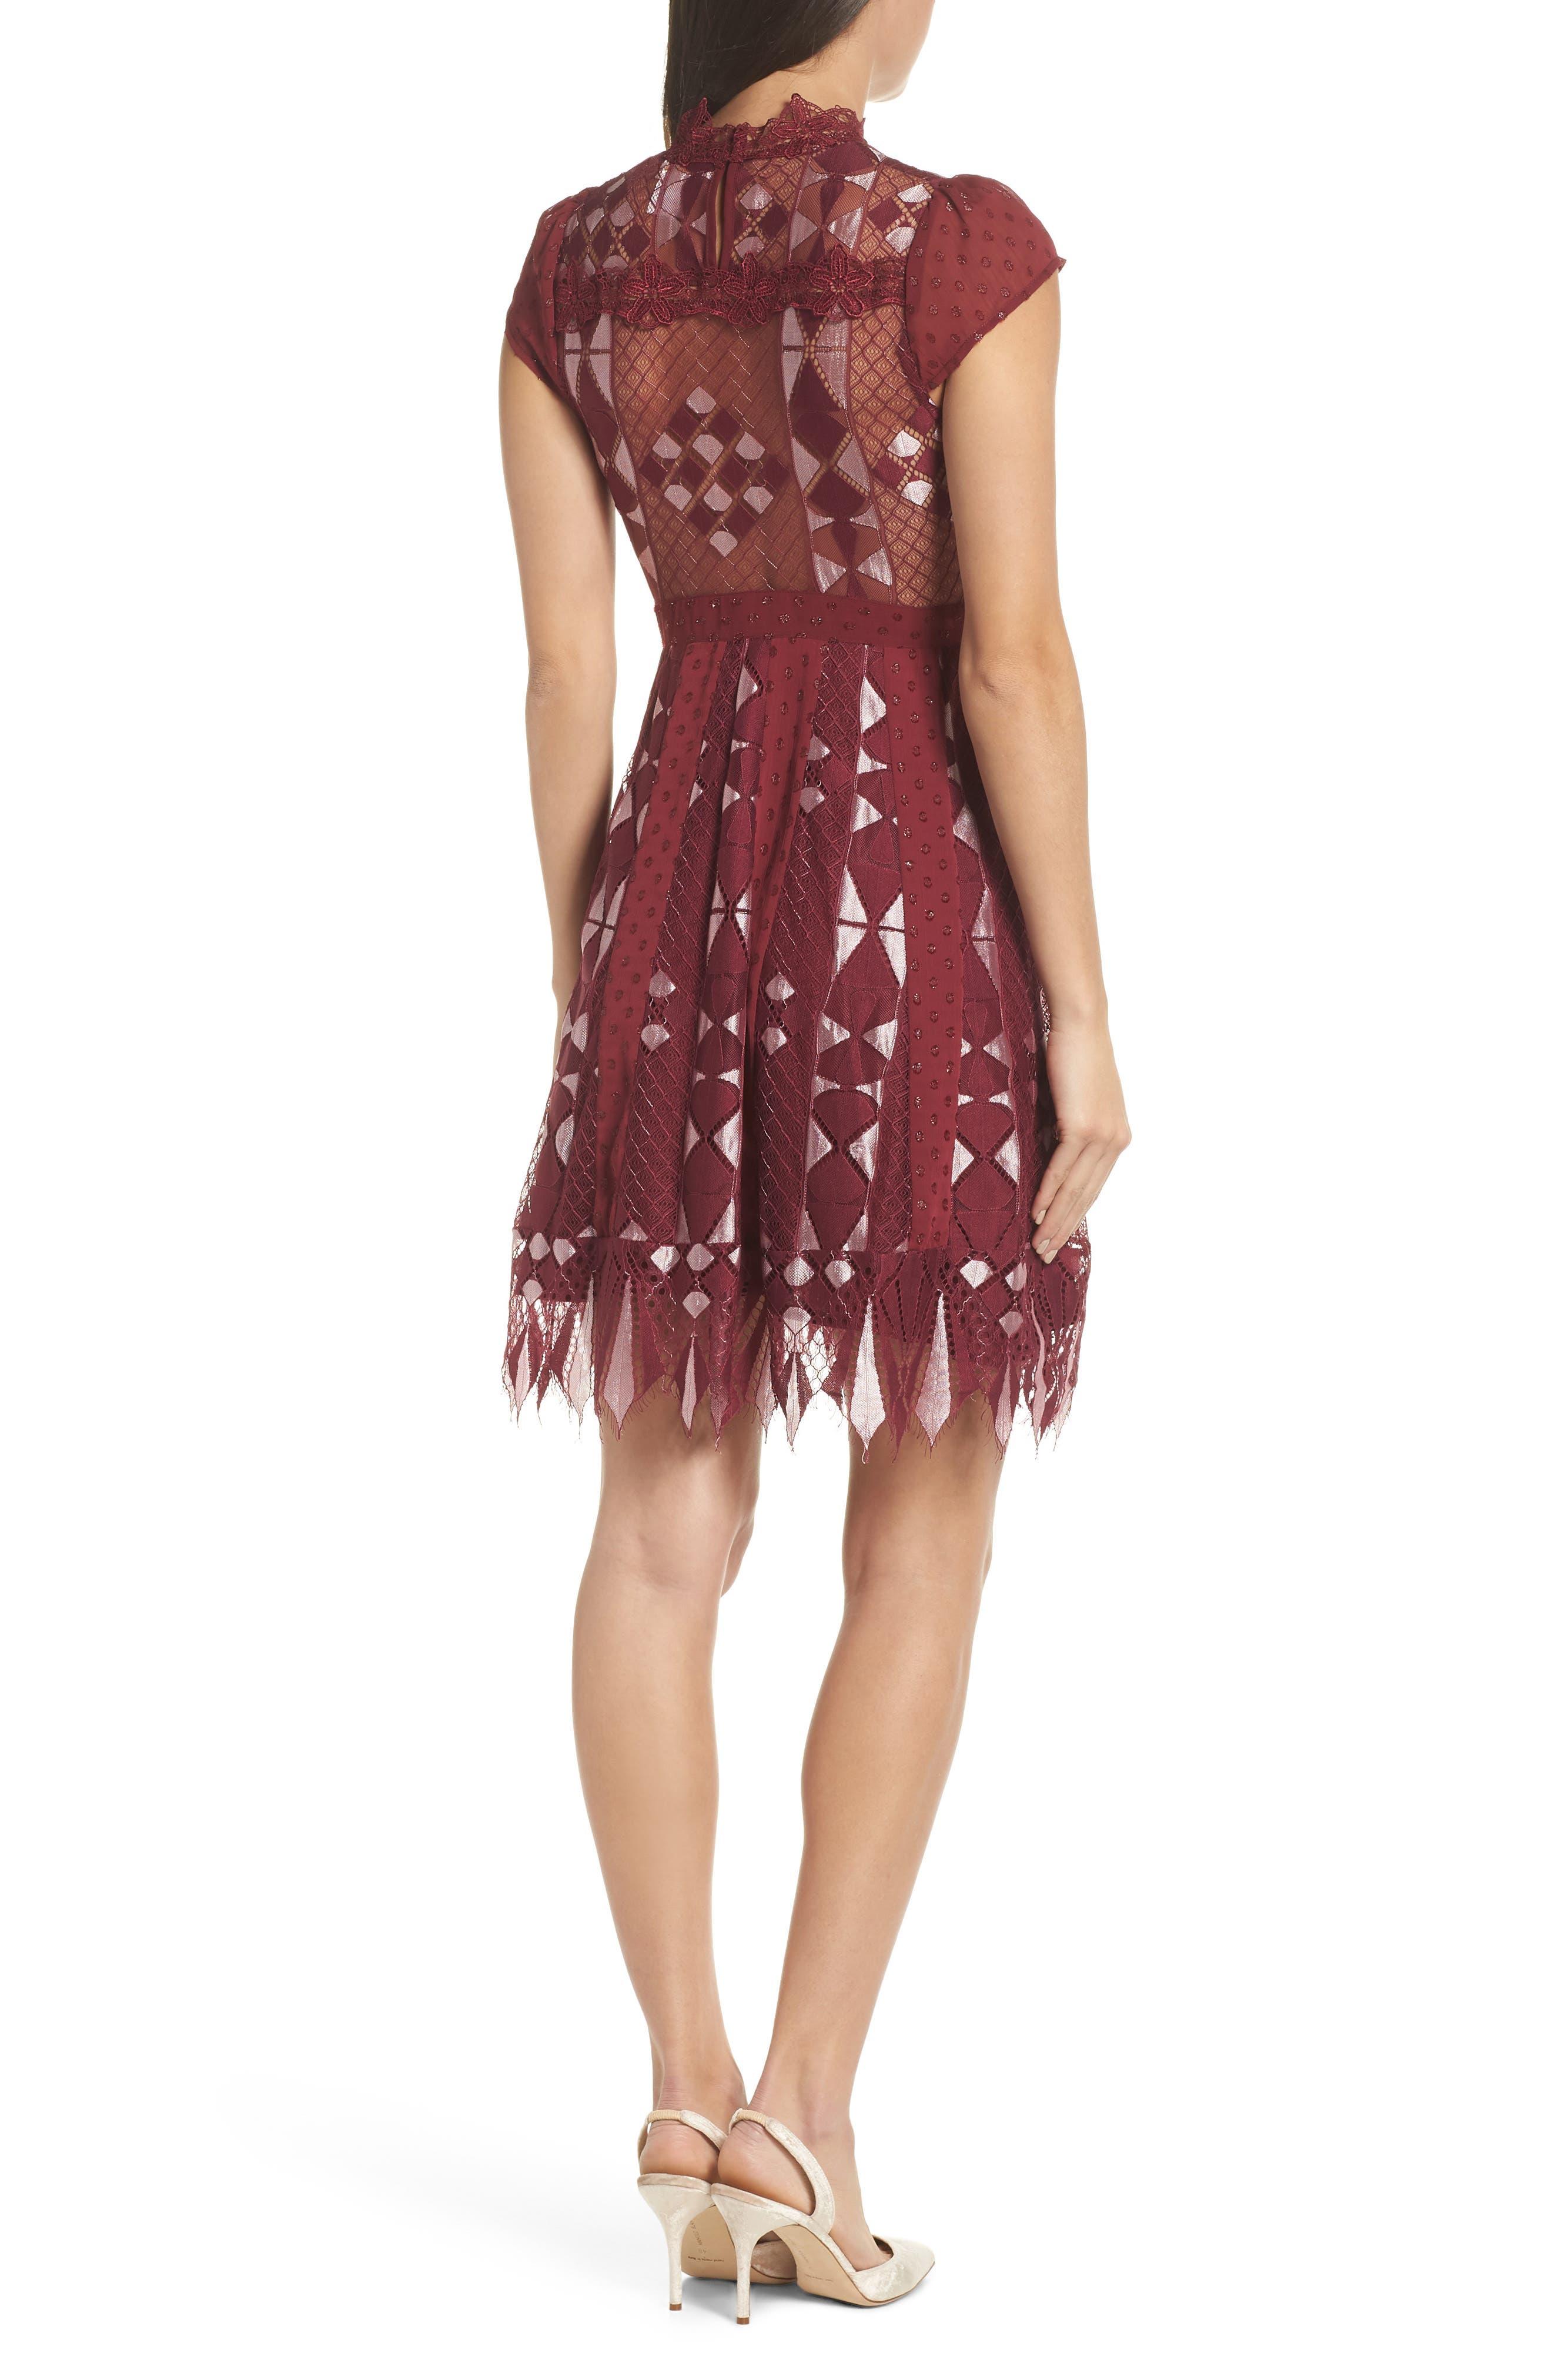 Bravo Zulu Fit & Flare Dress,                             Alternate thumbnail 2, color,                             WINE METALLIC